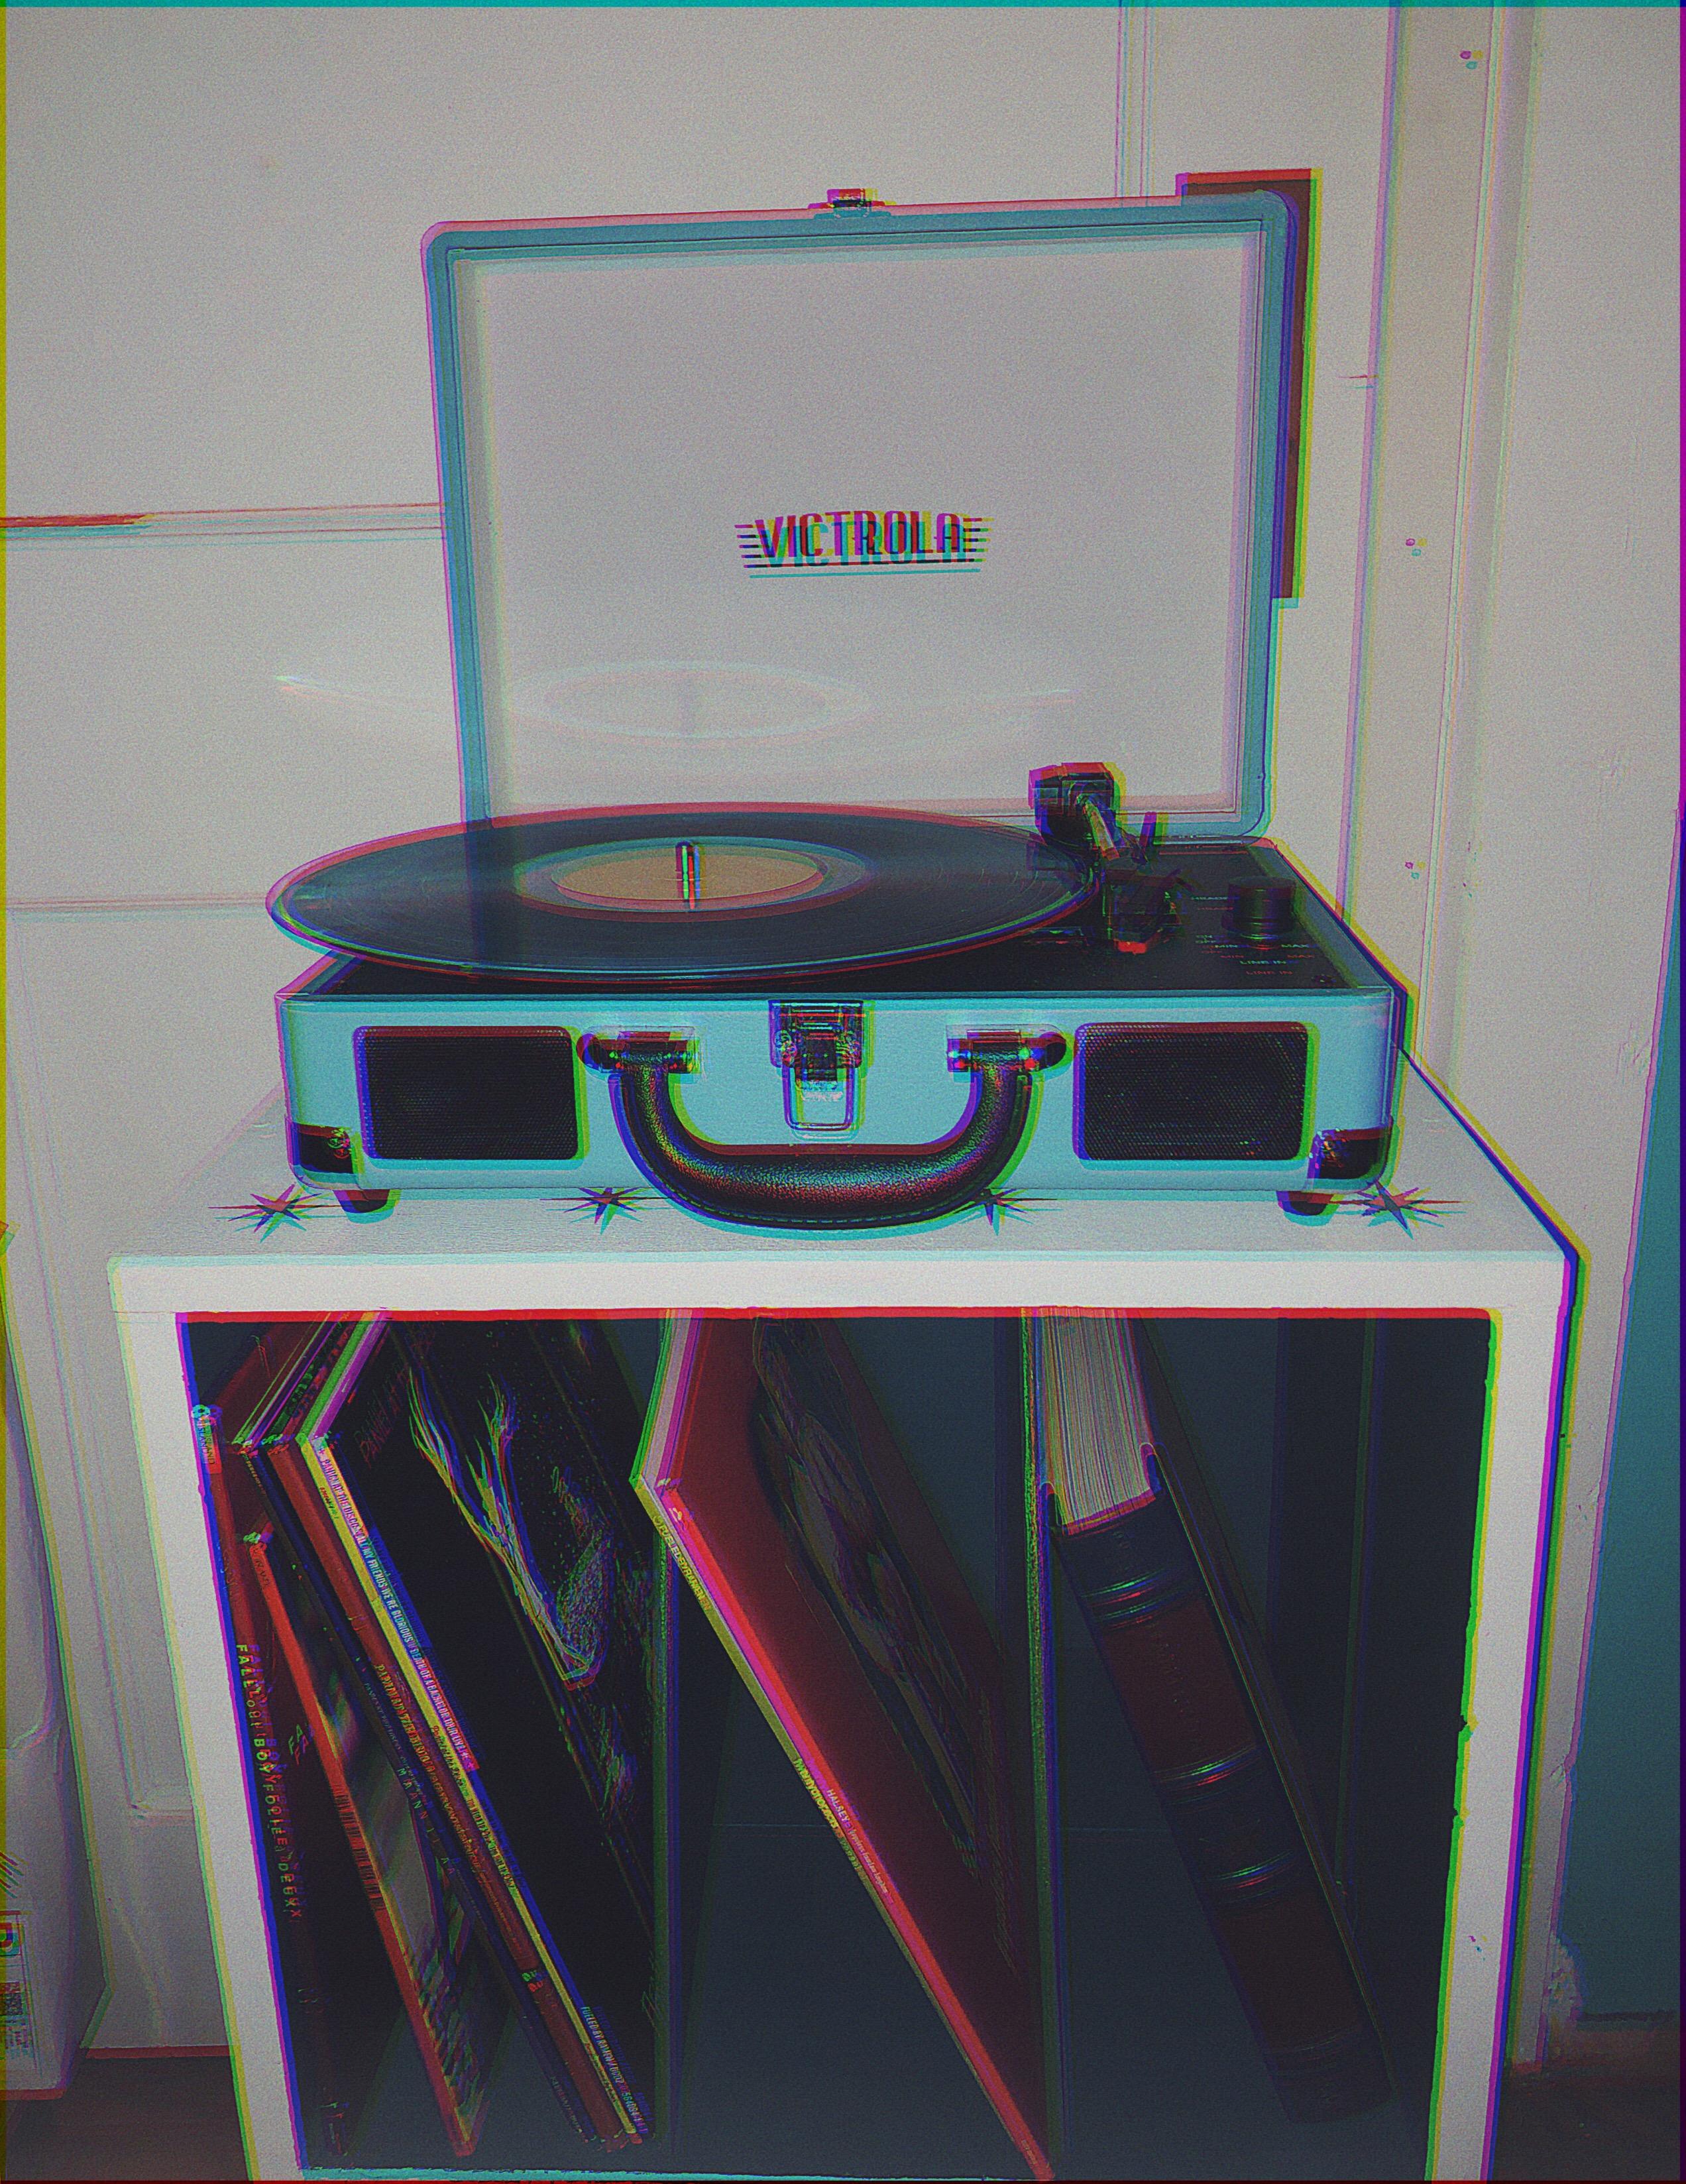 Yeet Aesthetic Glitch Vinyl Records Recordplayer Aesthe